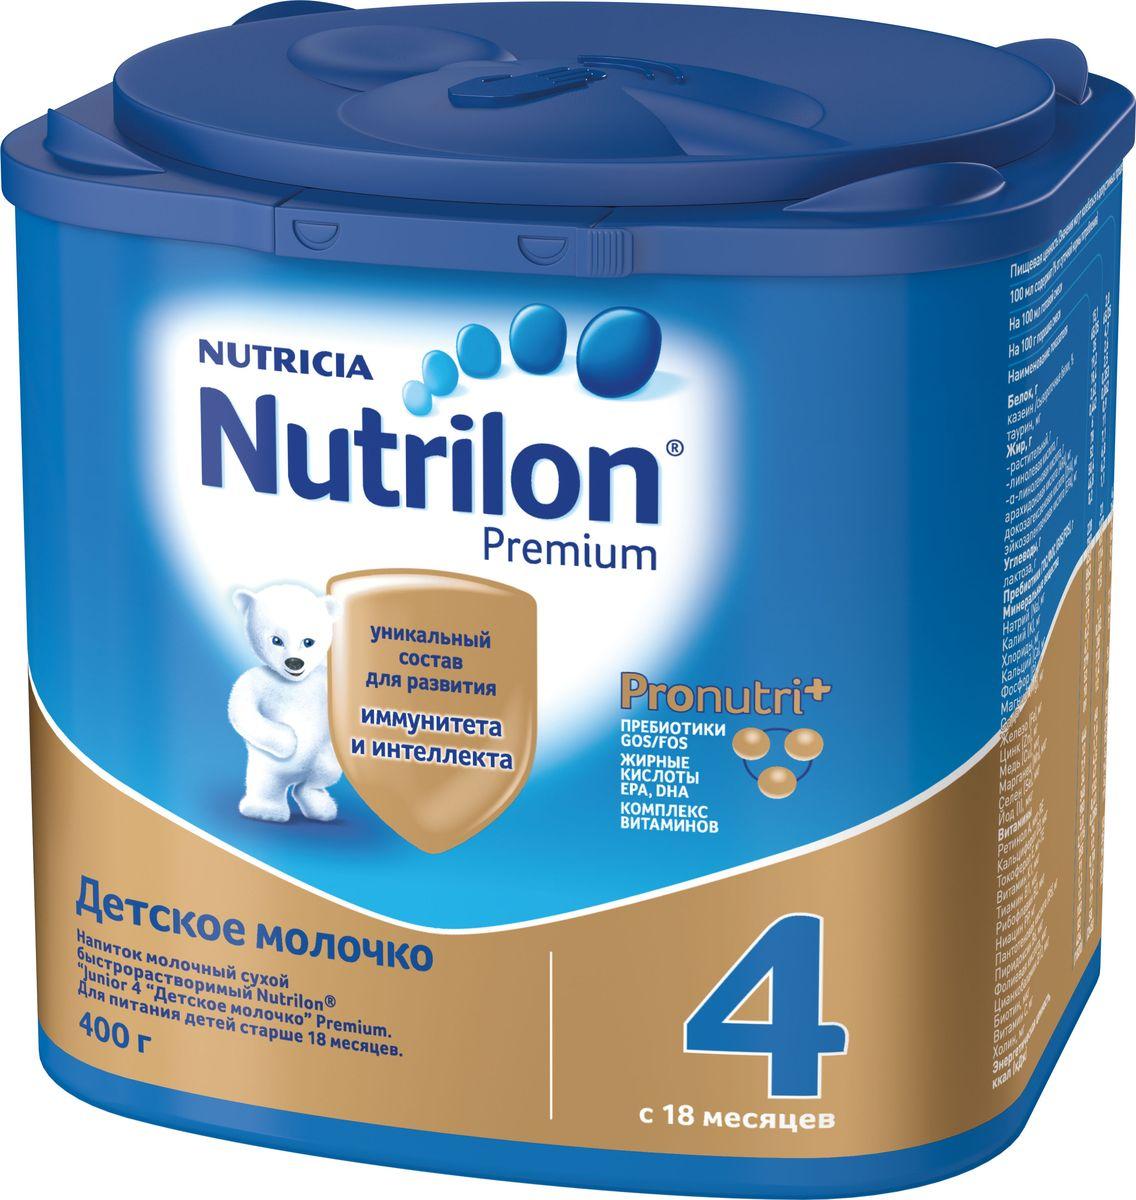 Nutrilon Джуниор Премиум 4 детское молочко PronutriPlus, с 18 месяцев, 400 г детское молочко малютка 4 700 г